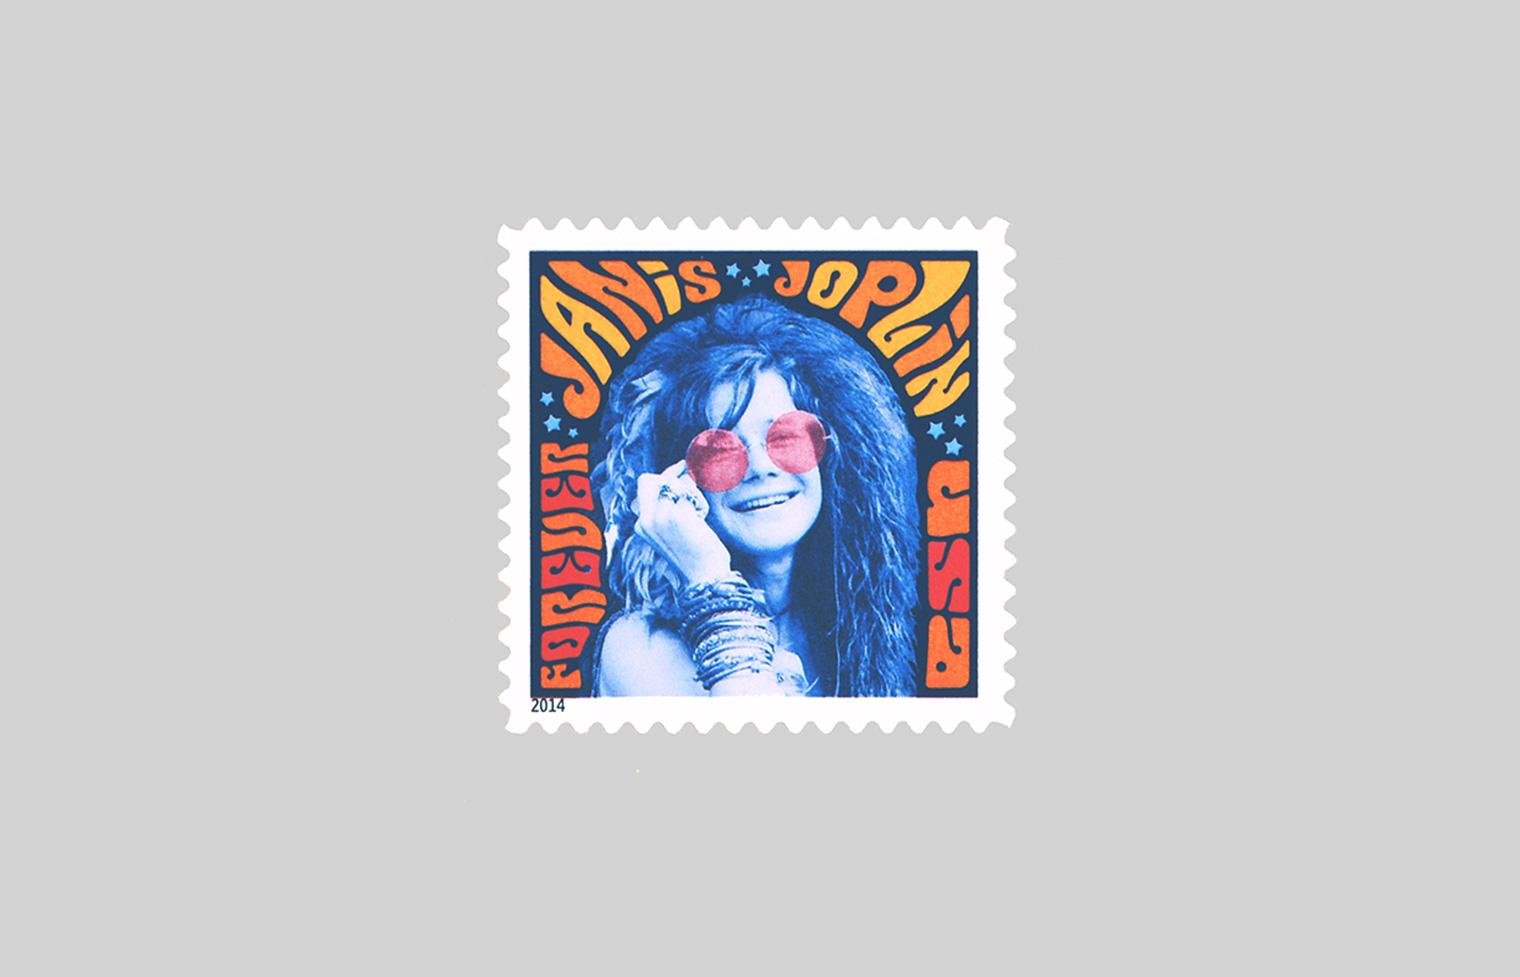 Janis Joplin Stamp